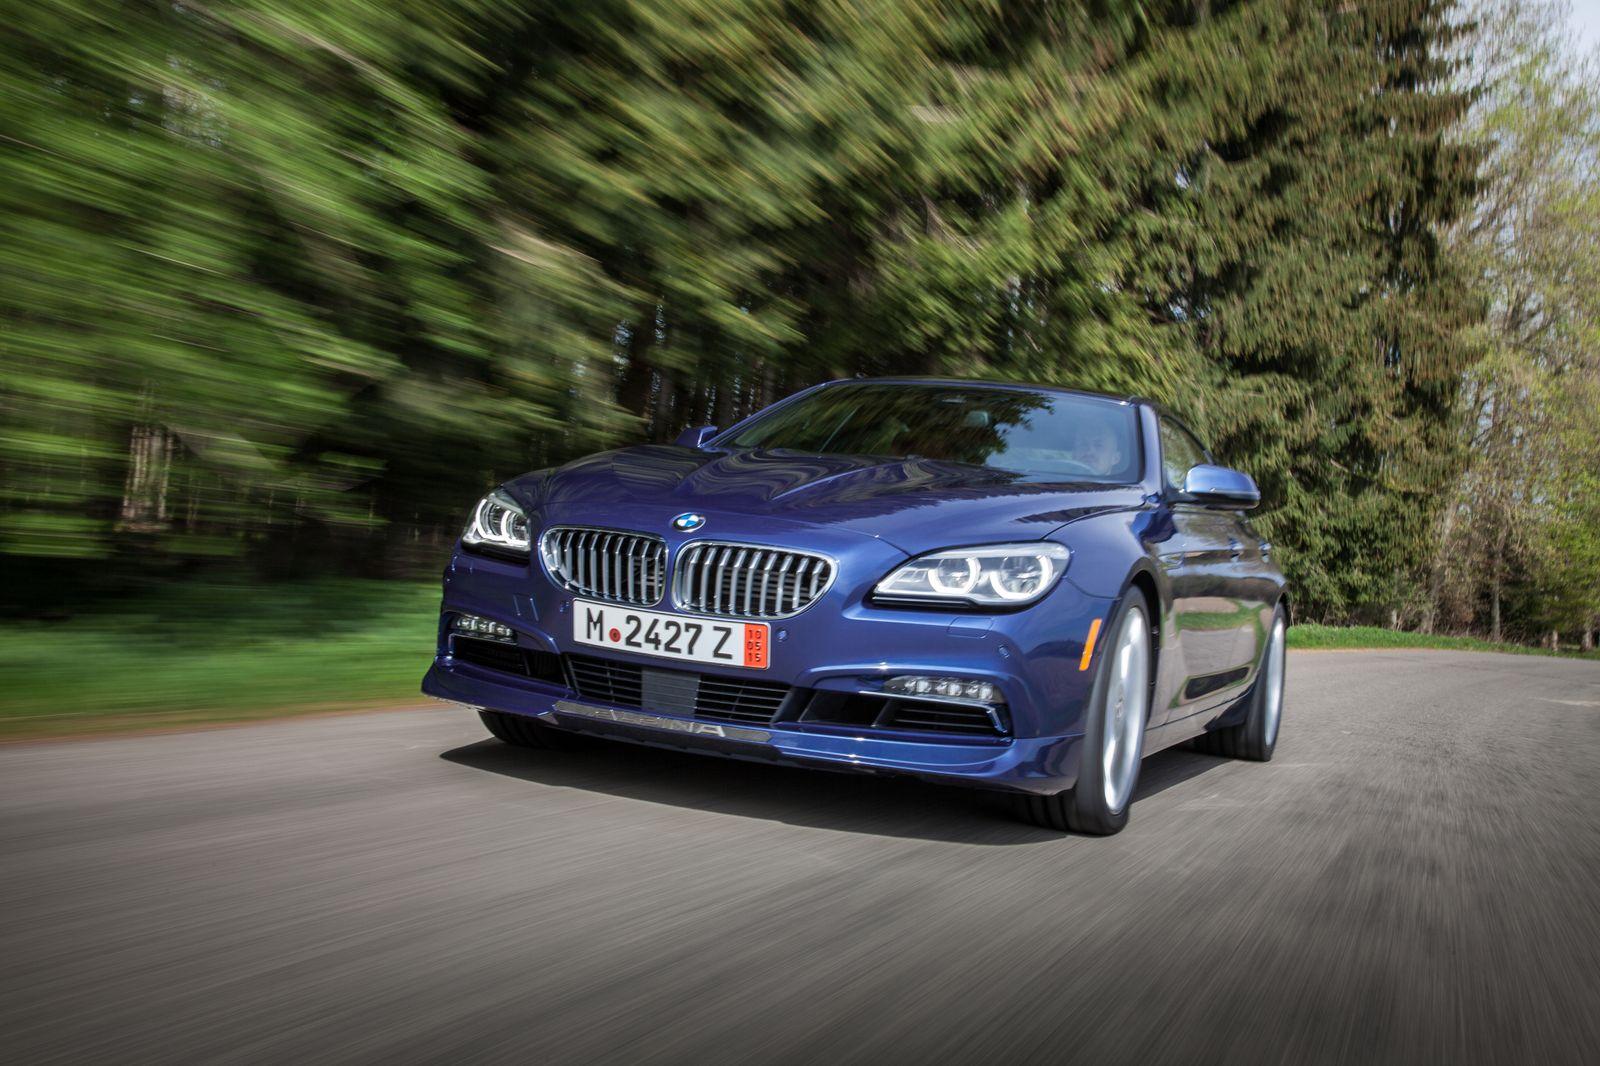 BMW ALPINA B6 xDrive Gran Coupe LCI / Fahrt